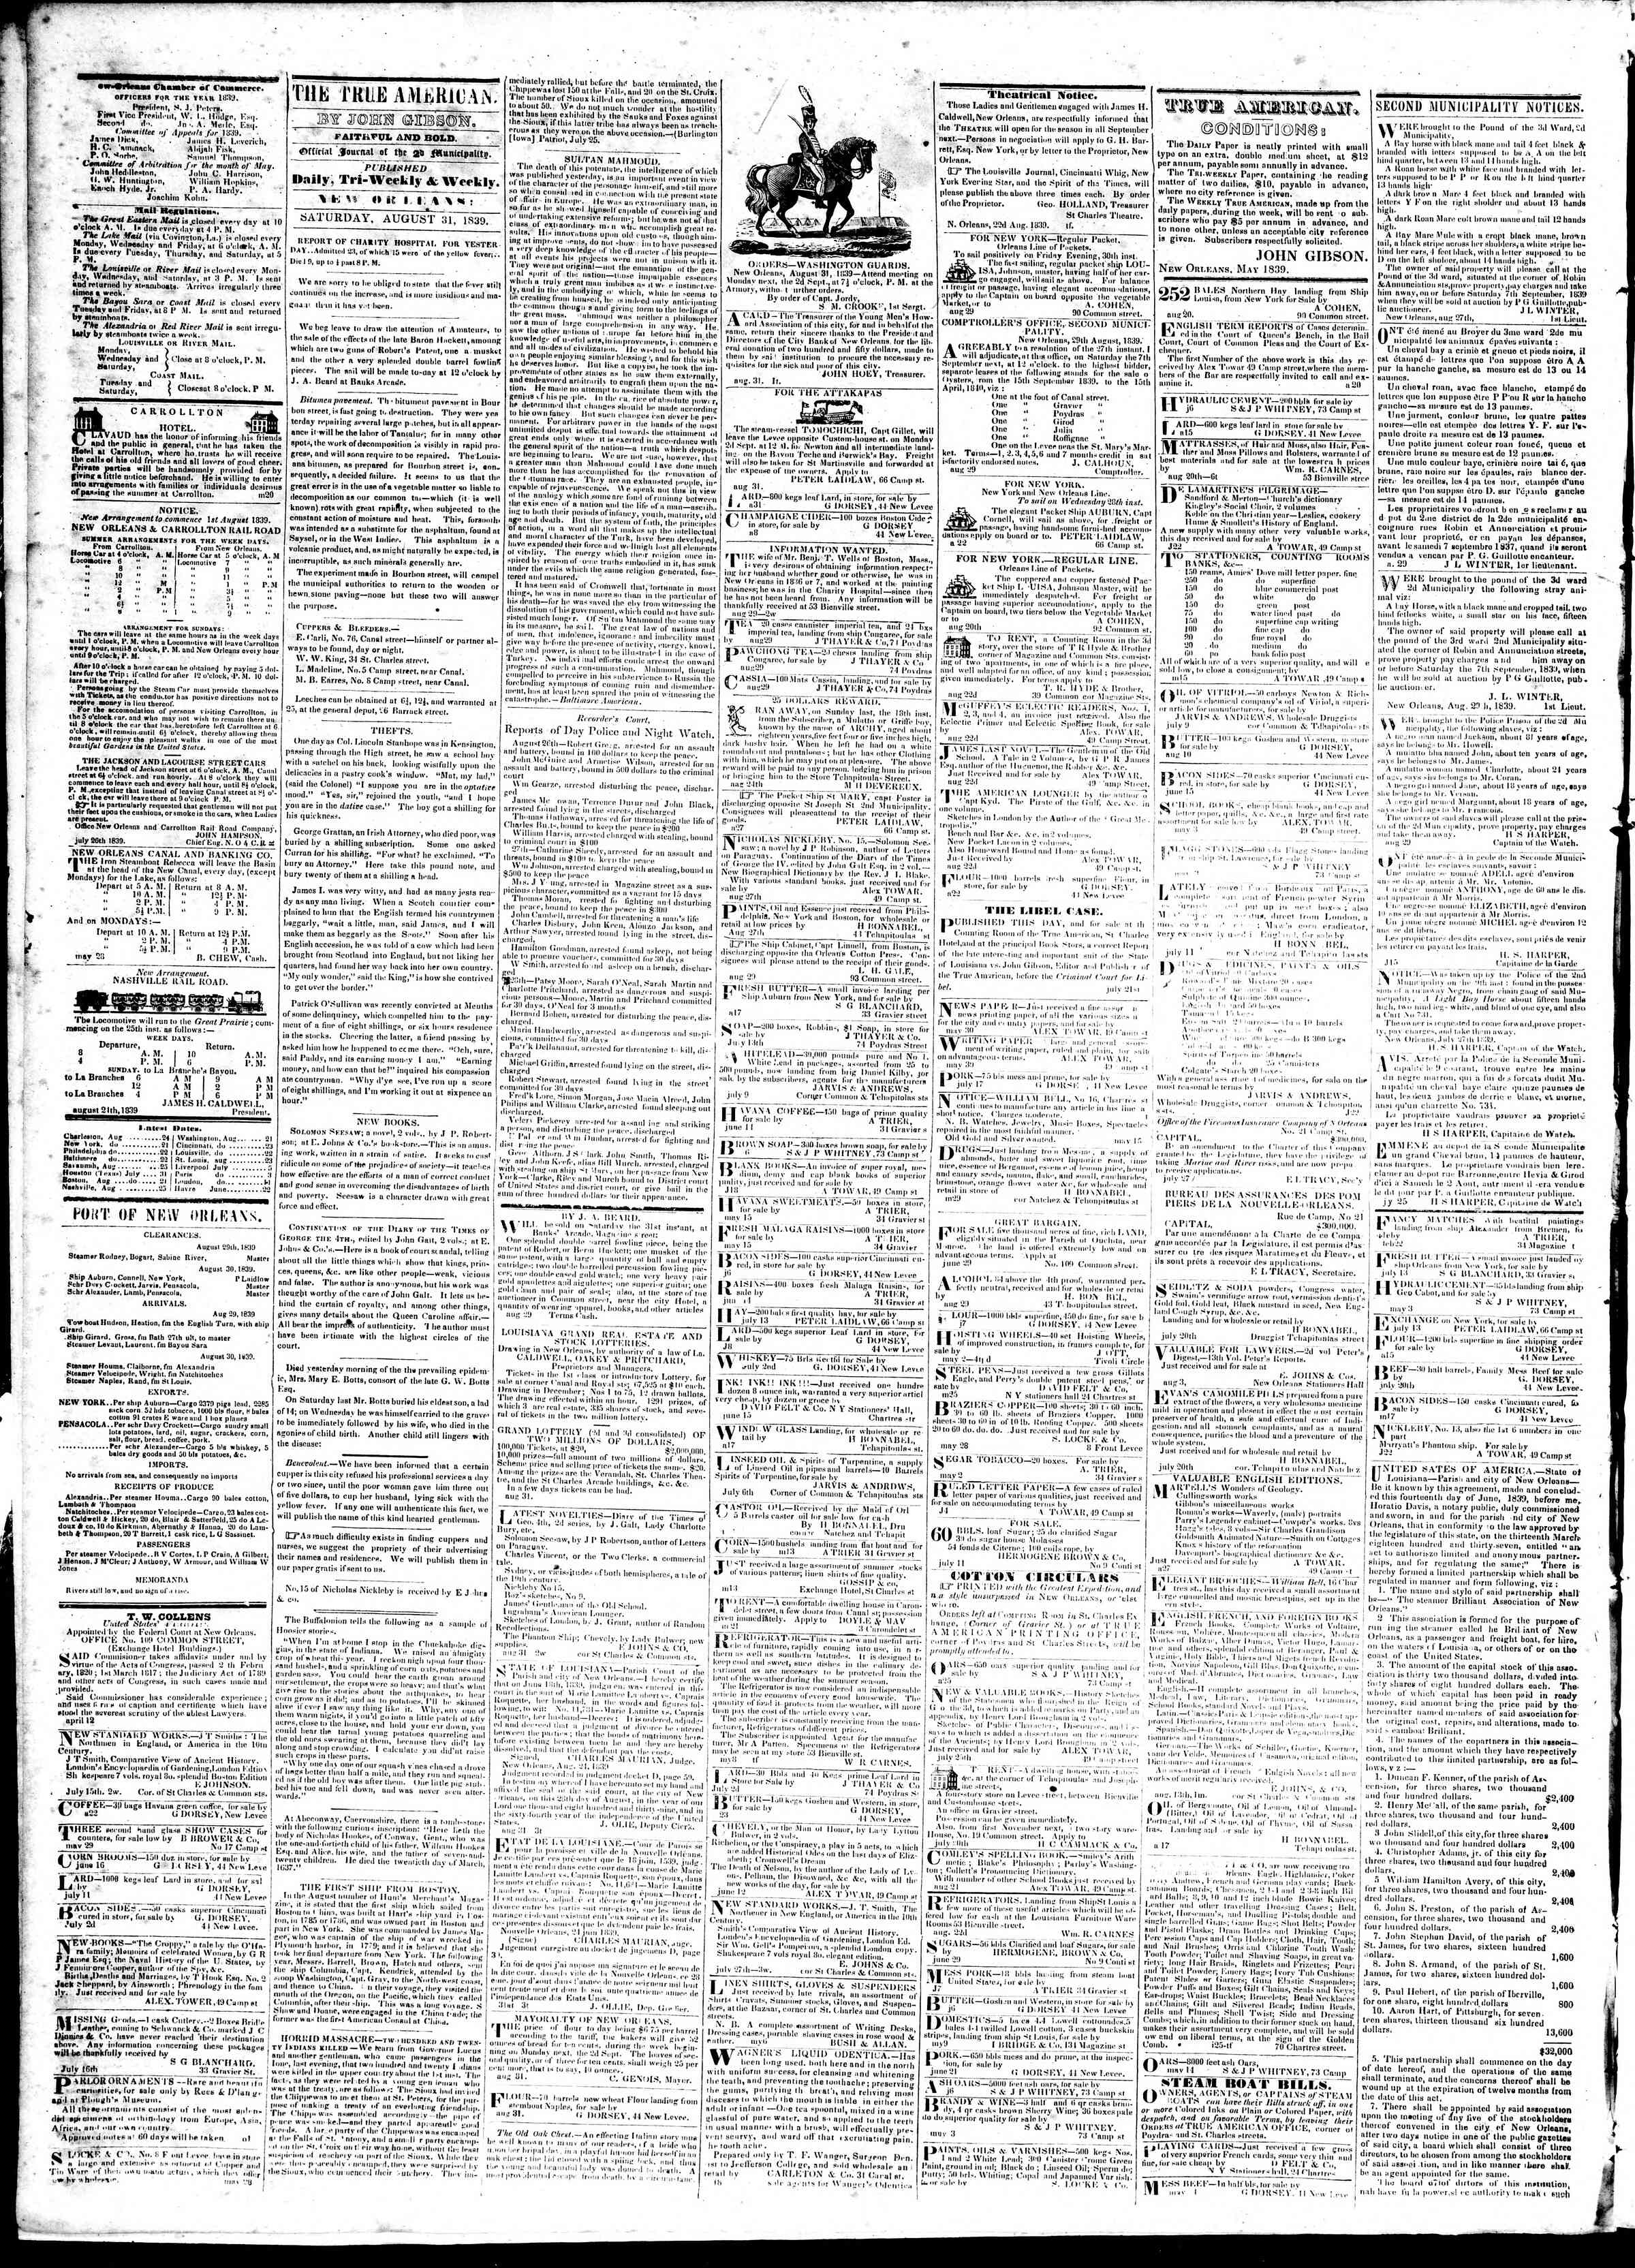 August 31, 1839 Tarihli True American Gazetesi Sayfa 2